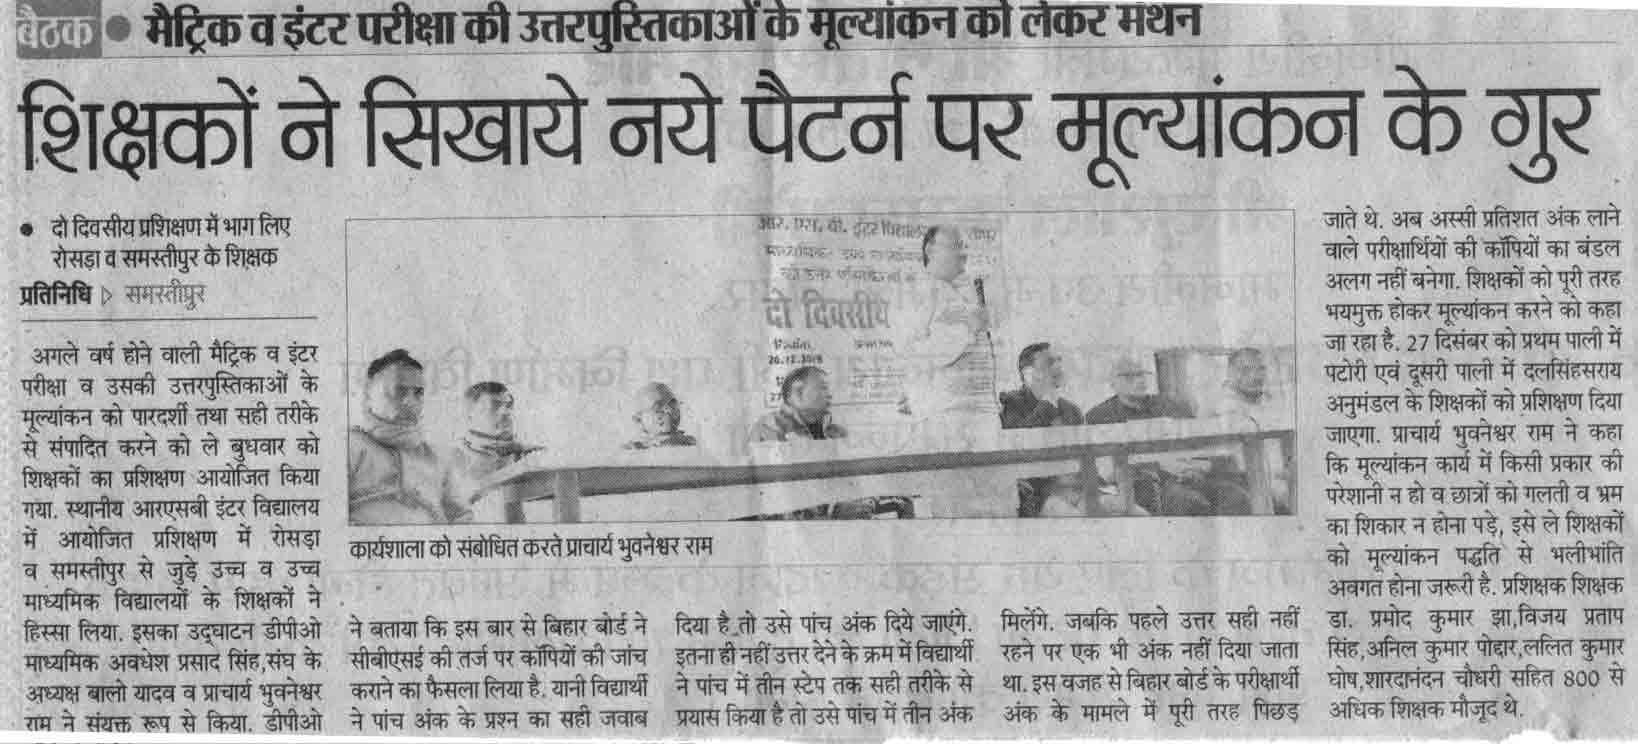 Bihar Board inter matric copy check on new pattern